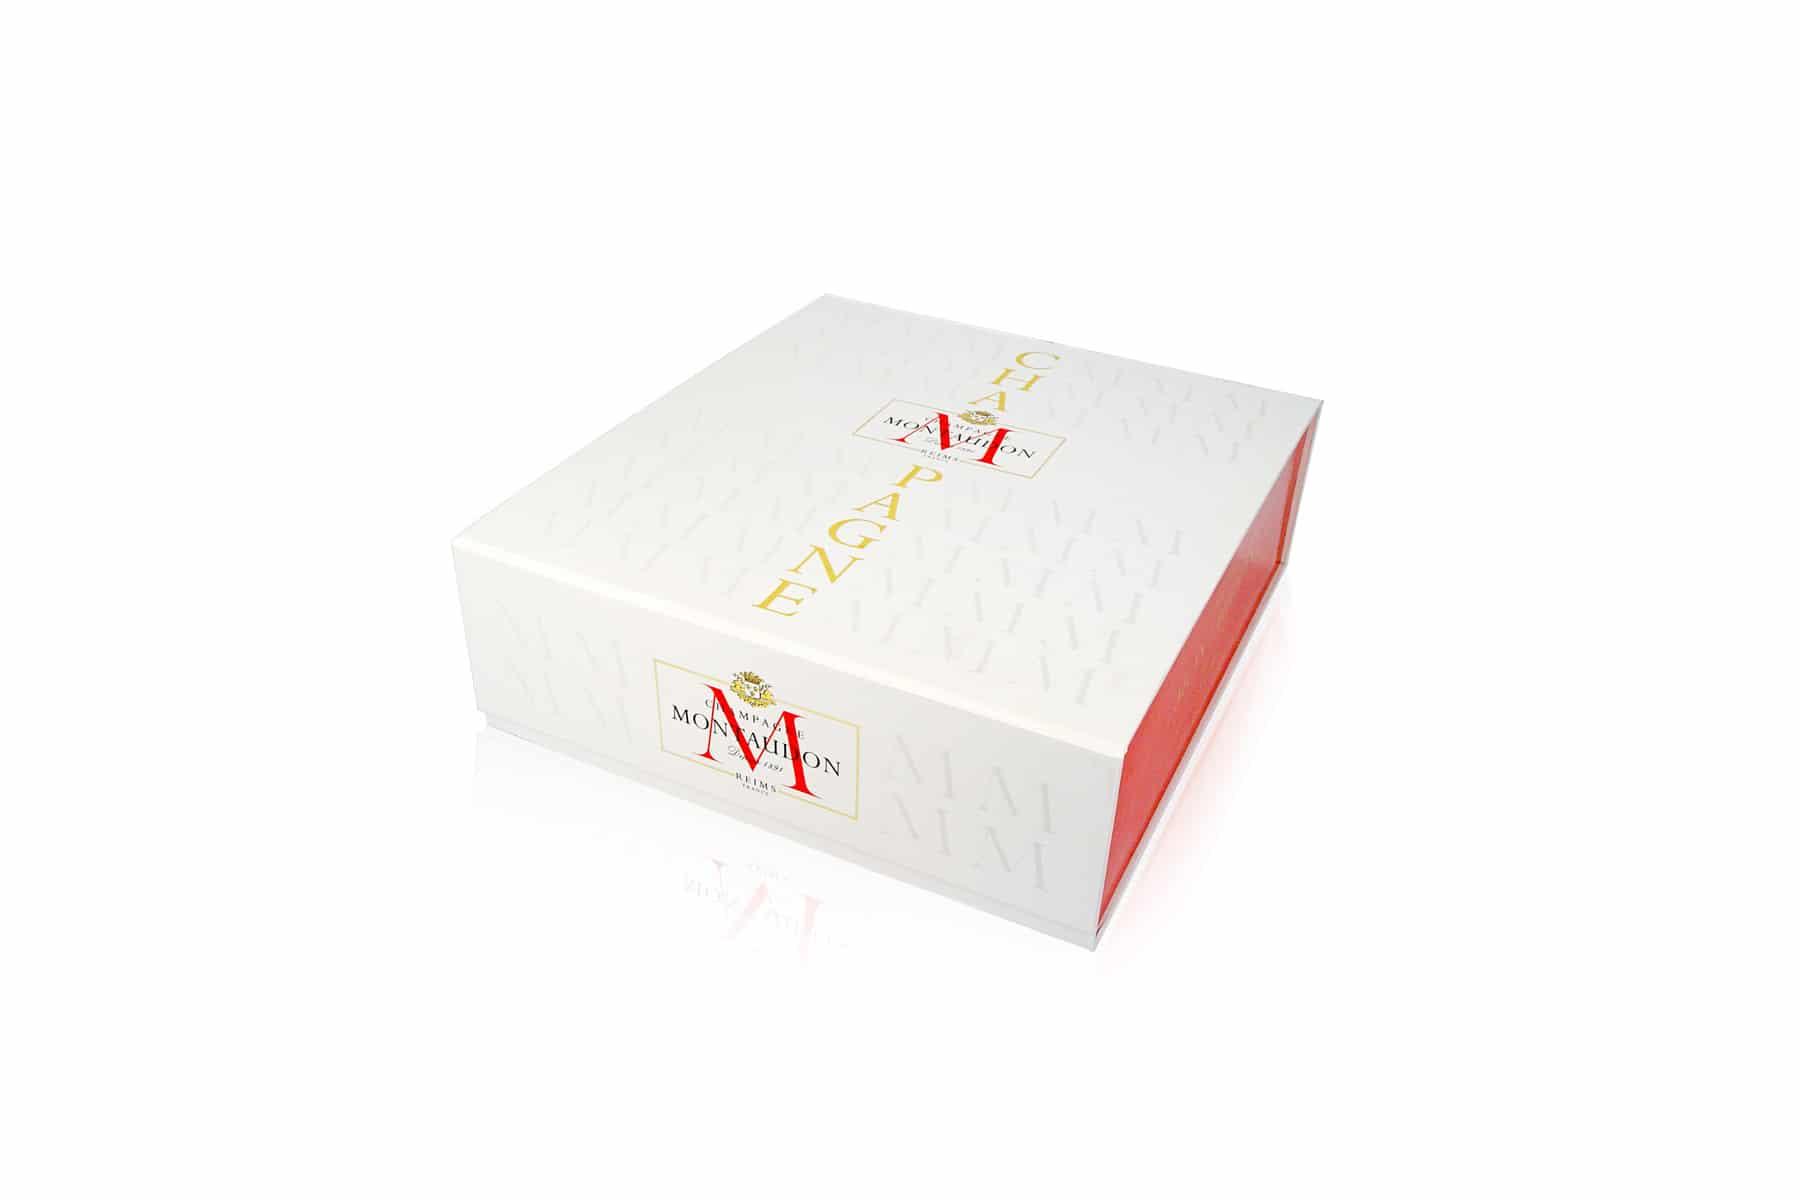 luxe-kartonnen-dozen-9-1800x1200